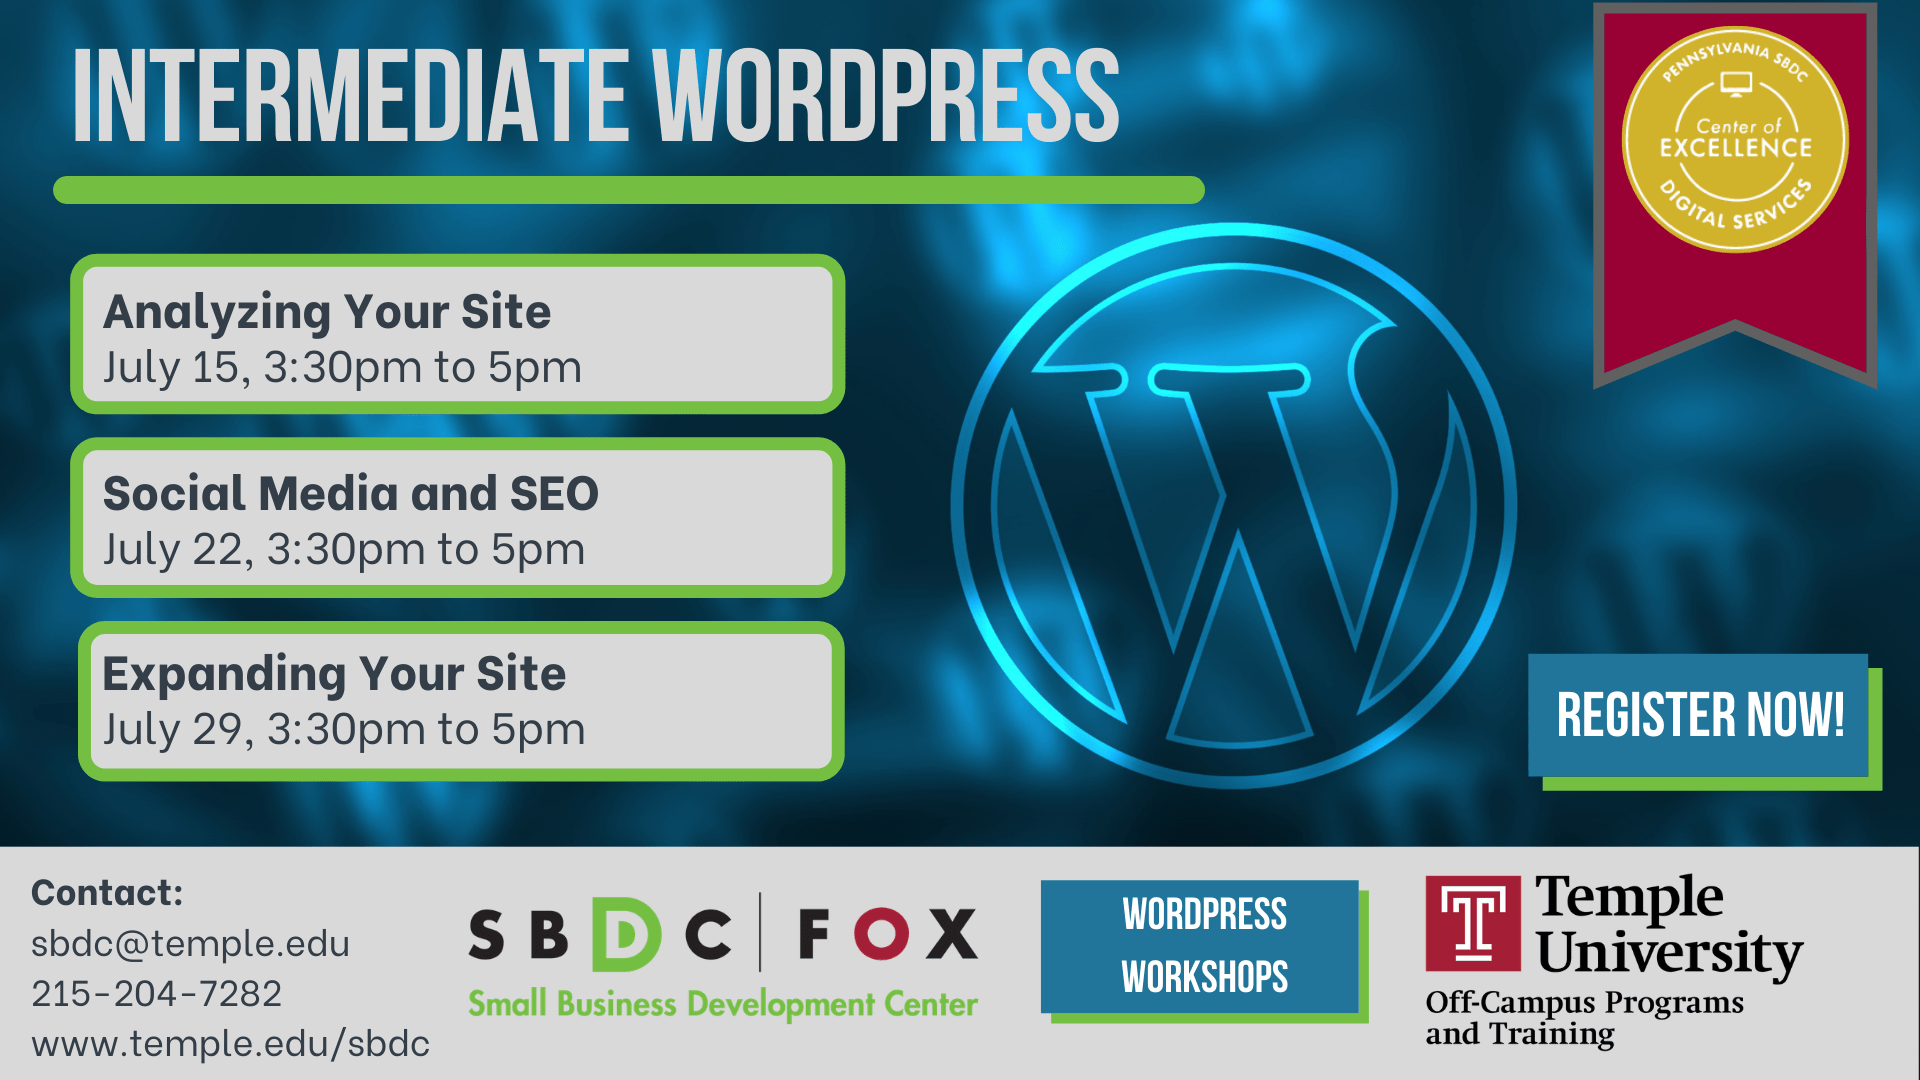 Intermediate WordPress: Social Media & SEO Event for July 22 @3:30pm to 5:30pm